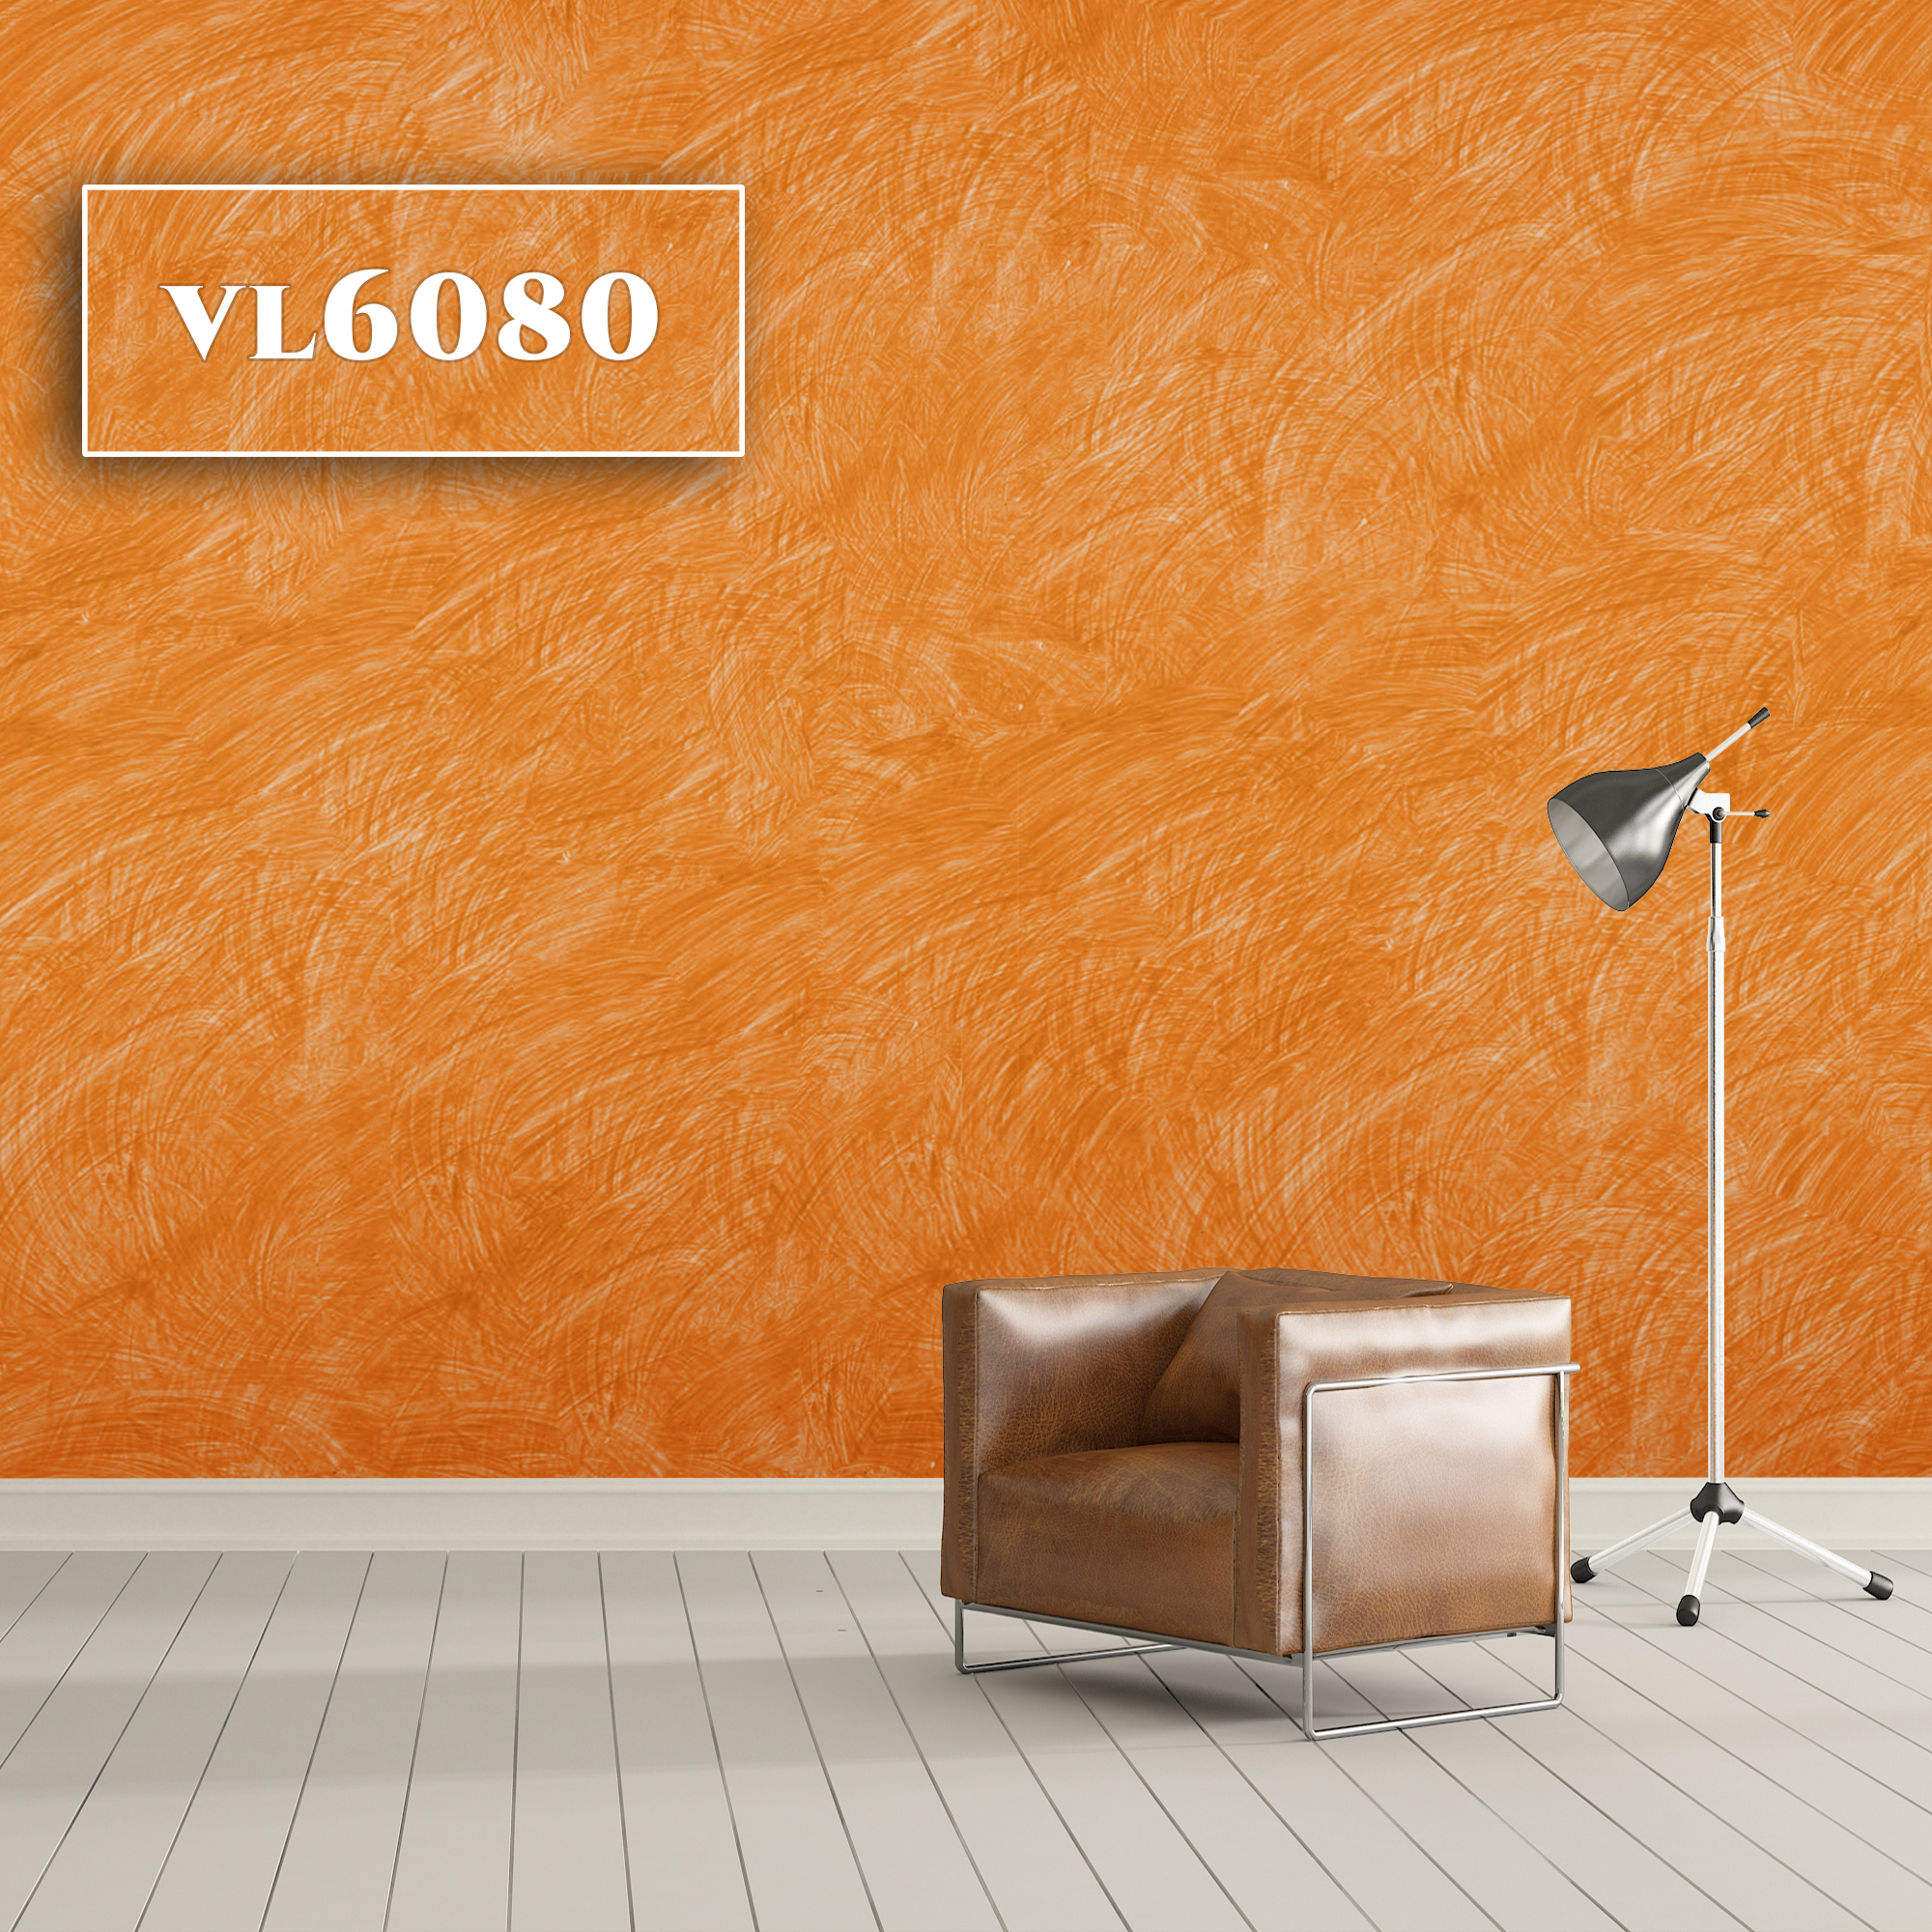 VL6080